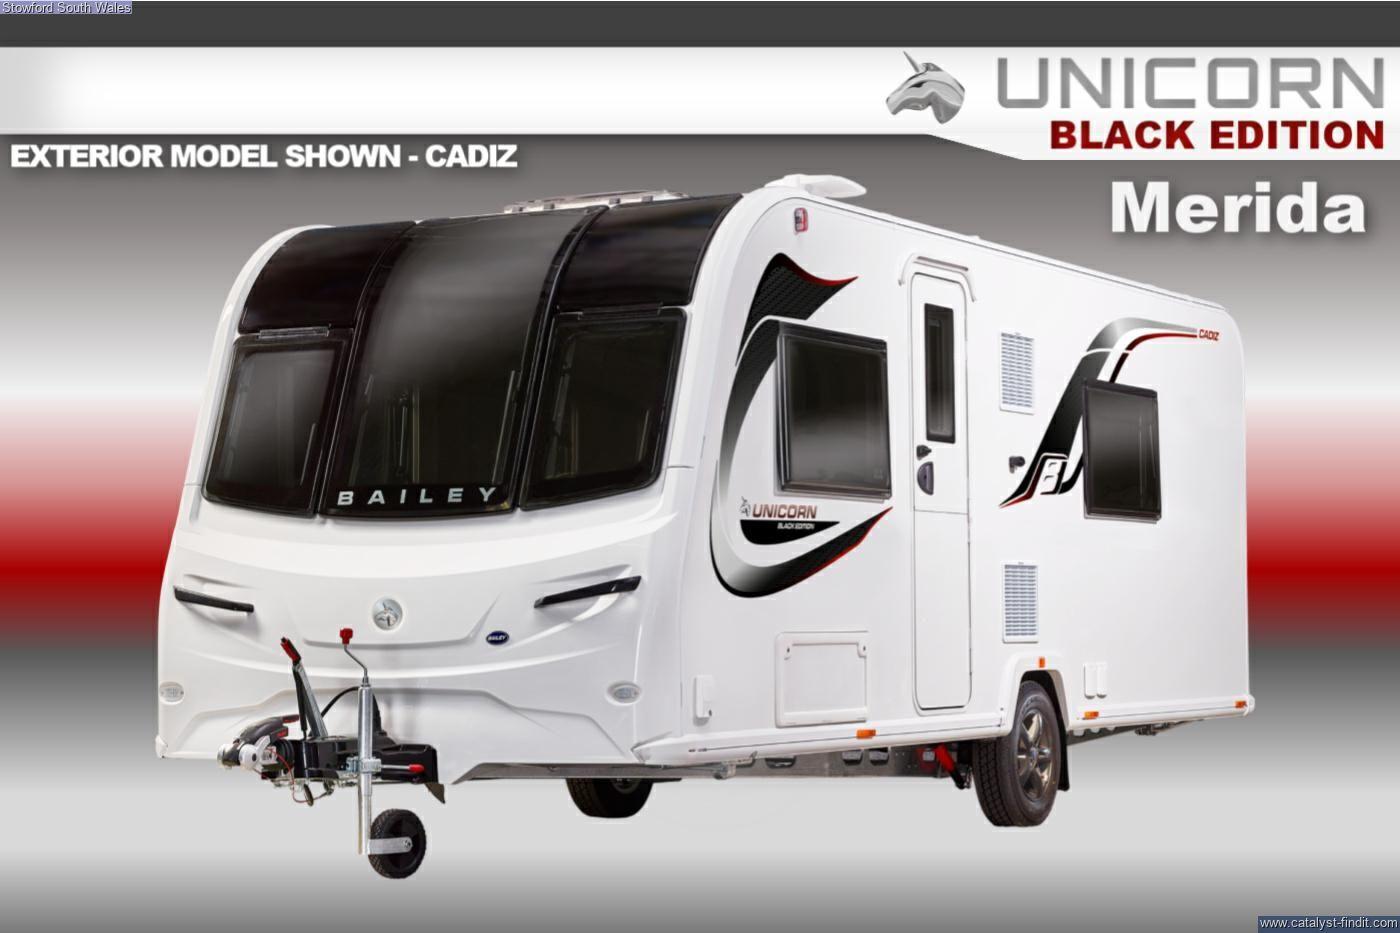 Bailey Unicorn Black Edition Merida 2021